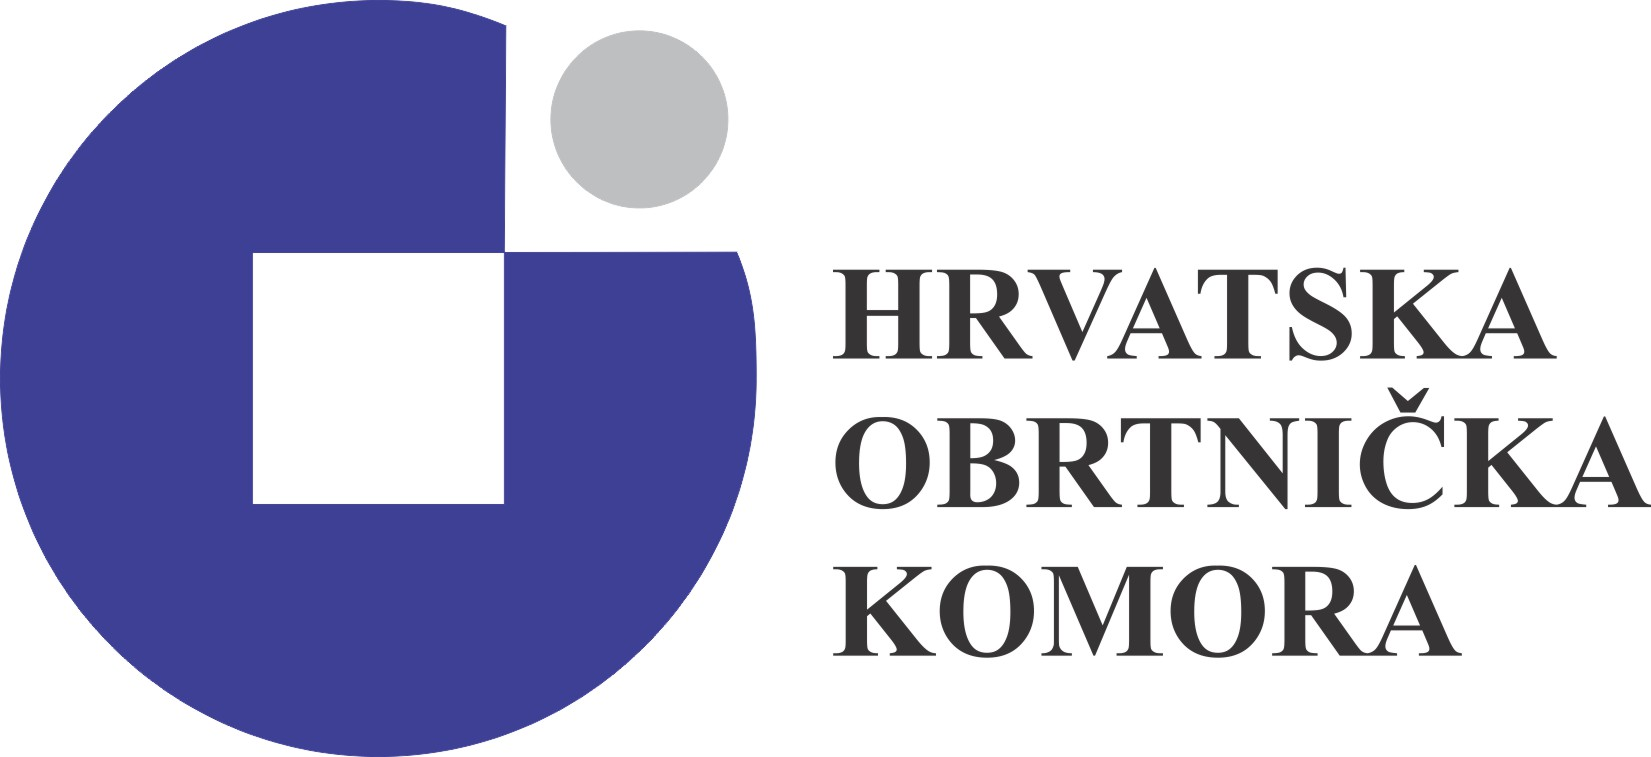 Statut Hrvatske Obrtničke Komore